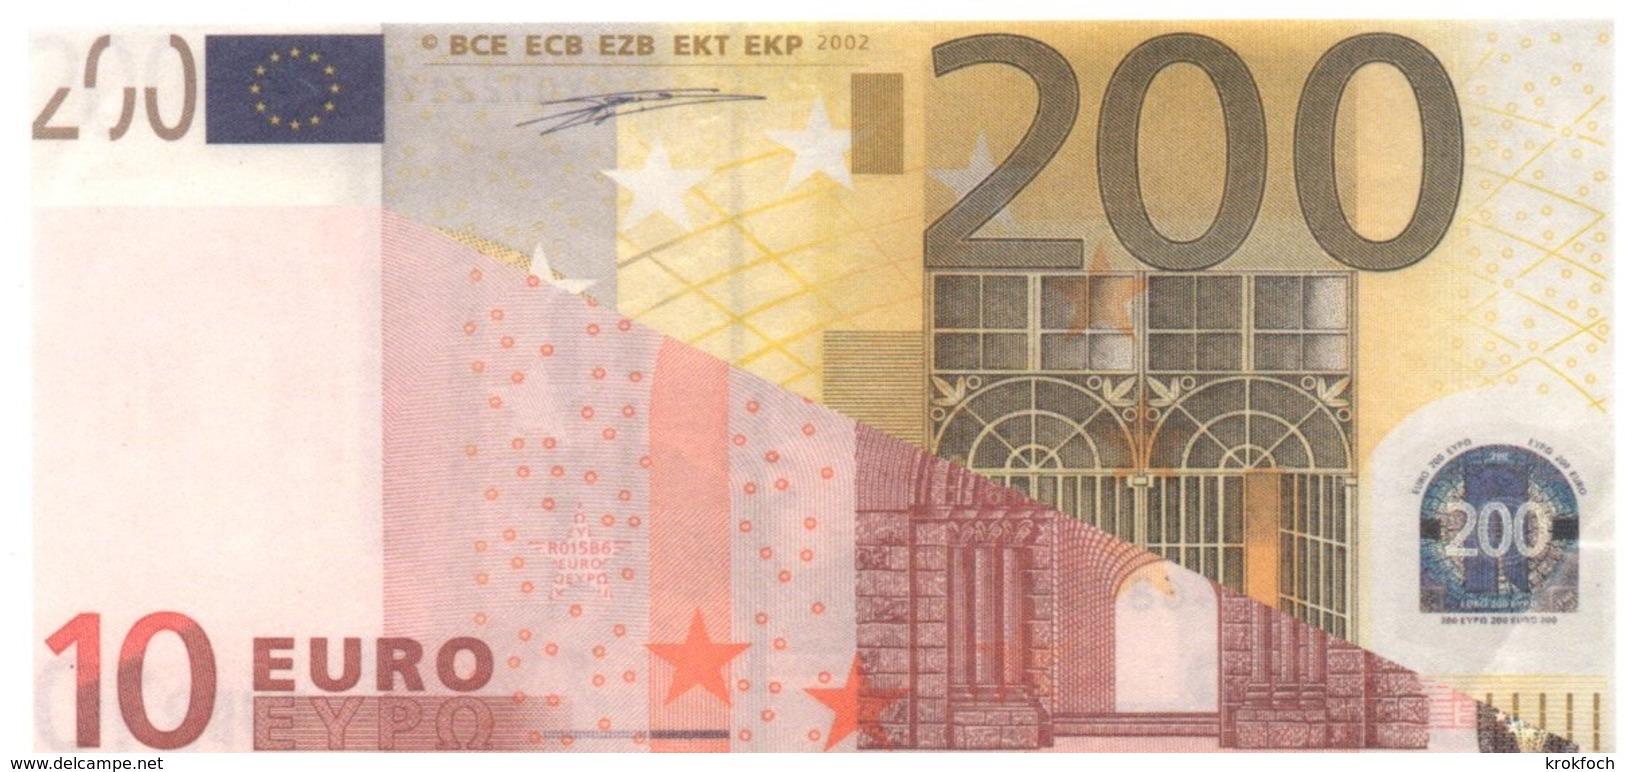 Montage Publicitaire Billet 10 & 200 Euros - Vierge Au Verso - EURO